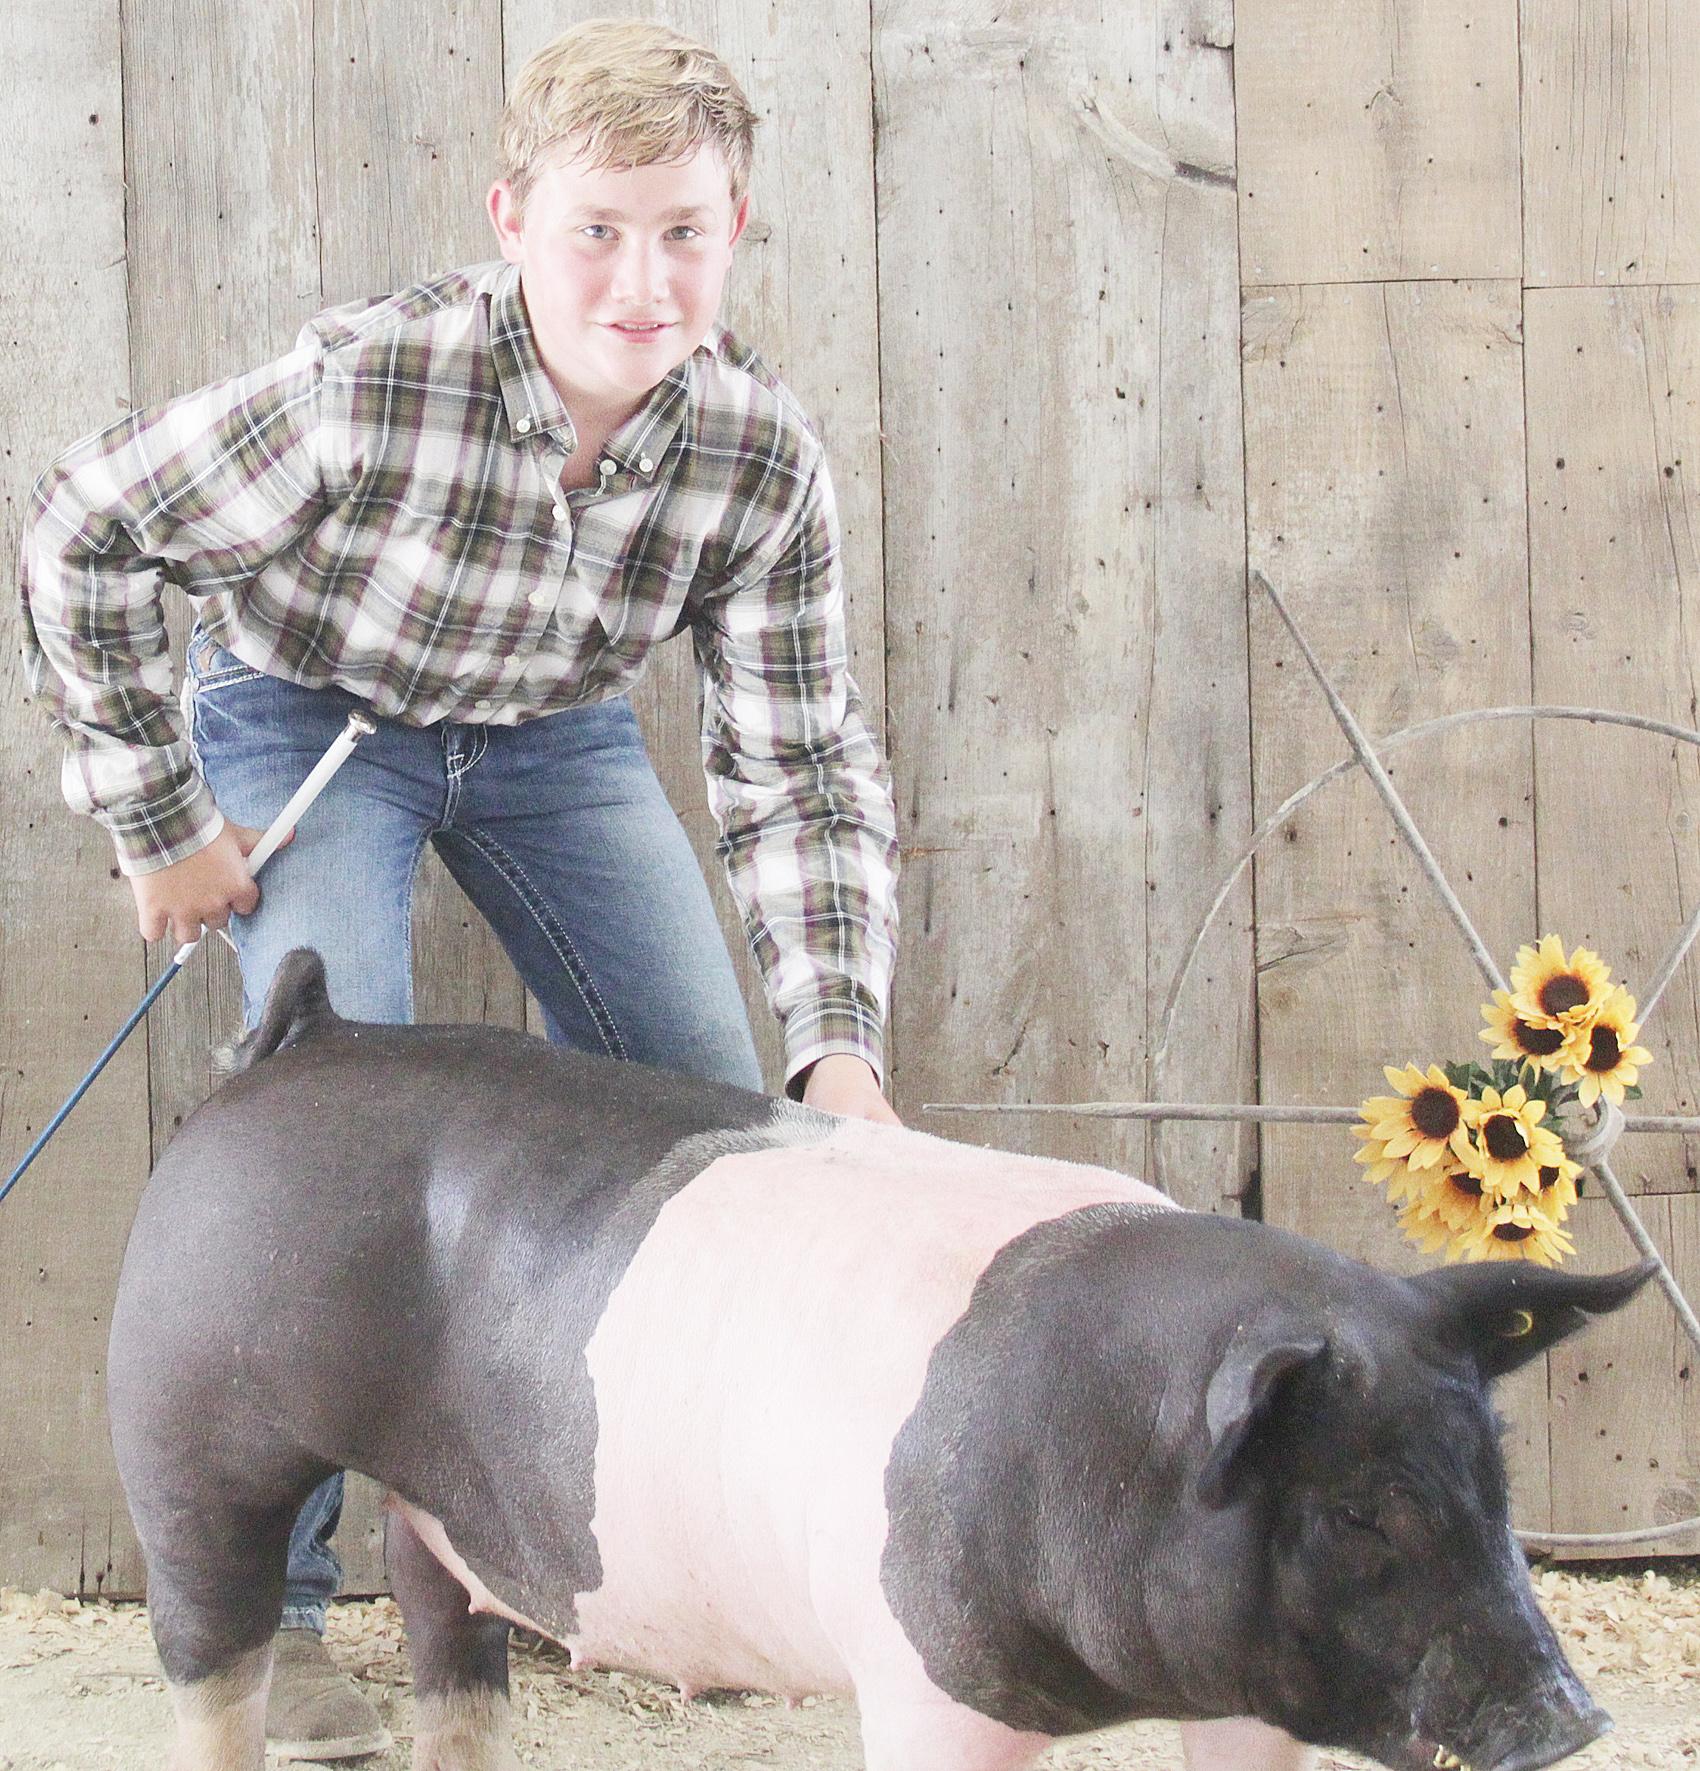 Reece Burns of the Straight Arrows 4-H Club was named Champion intermediate hog showman at the 2020 Jackson County Fair.